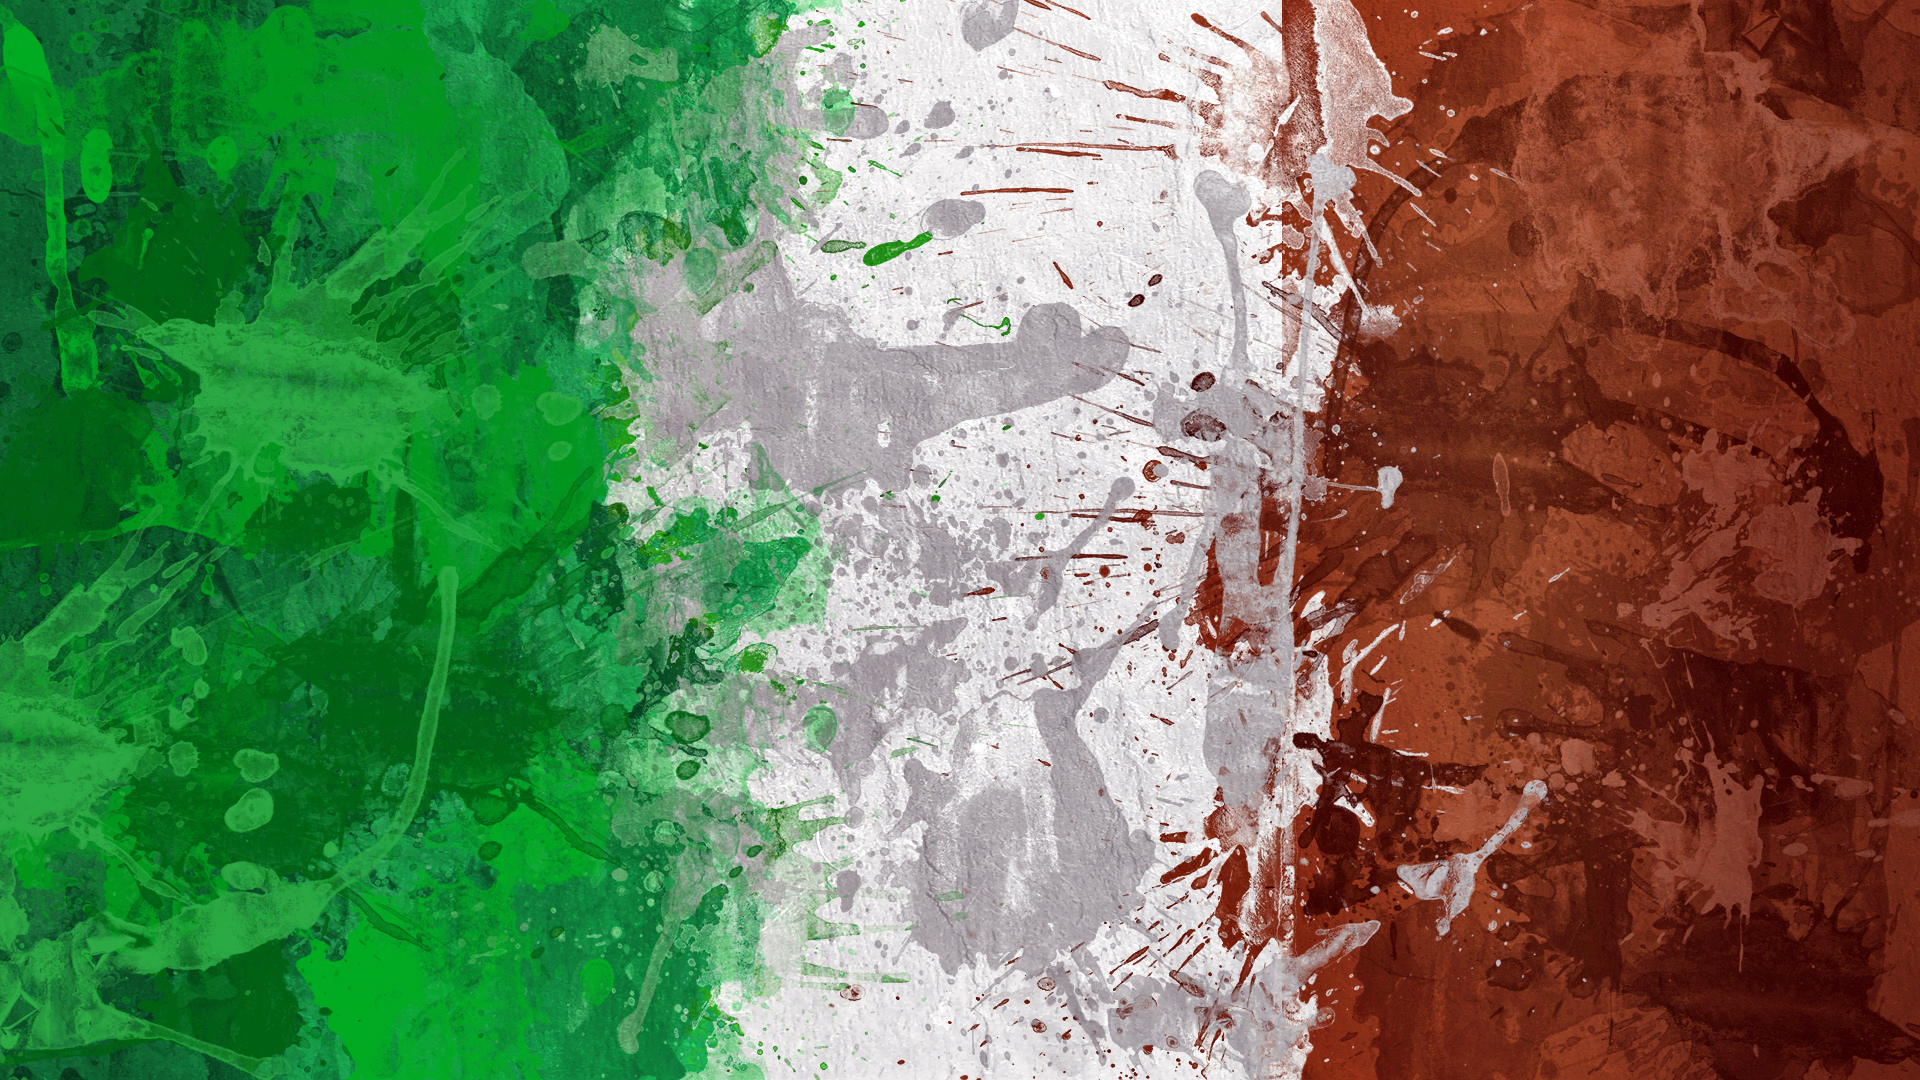 Download Italian Flag Wallpaper 1920x1080 Download [1920x1080 1920x1080